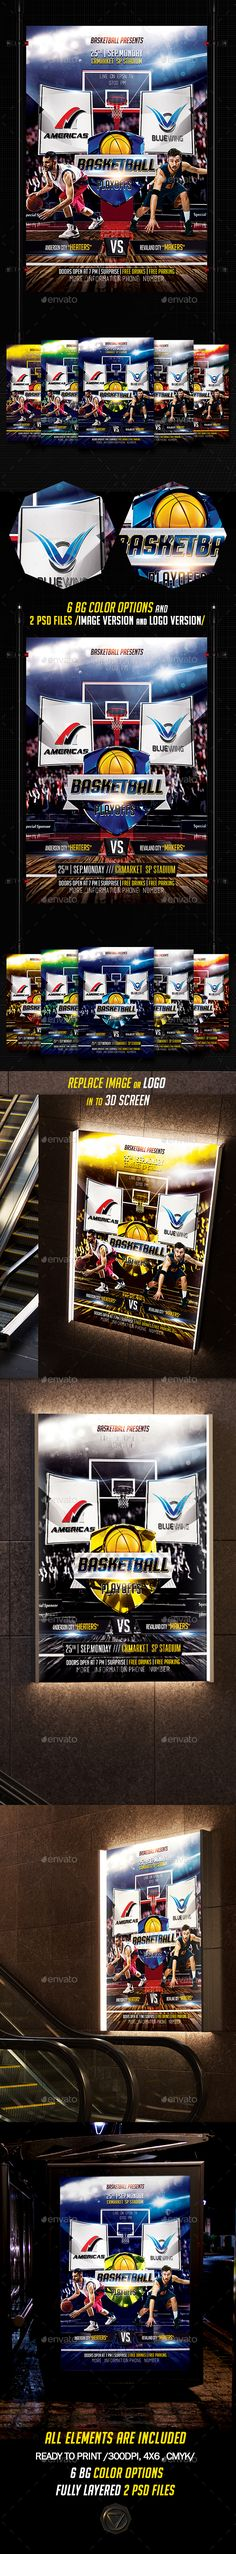 Basketball Madness  — PSD Template #sport logo mockup #tournament #usa #4x6…